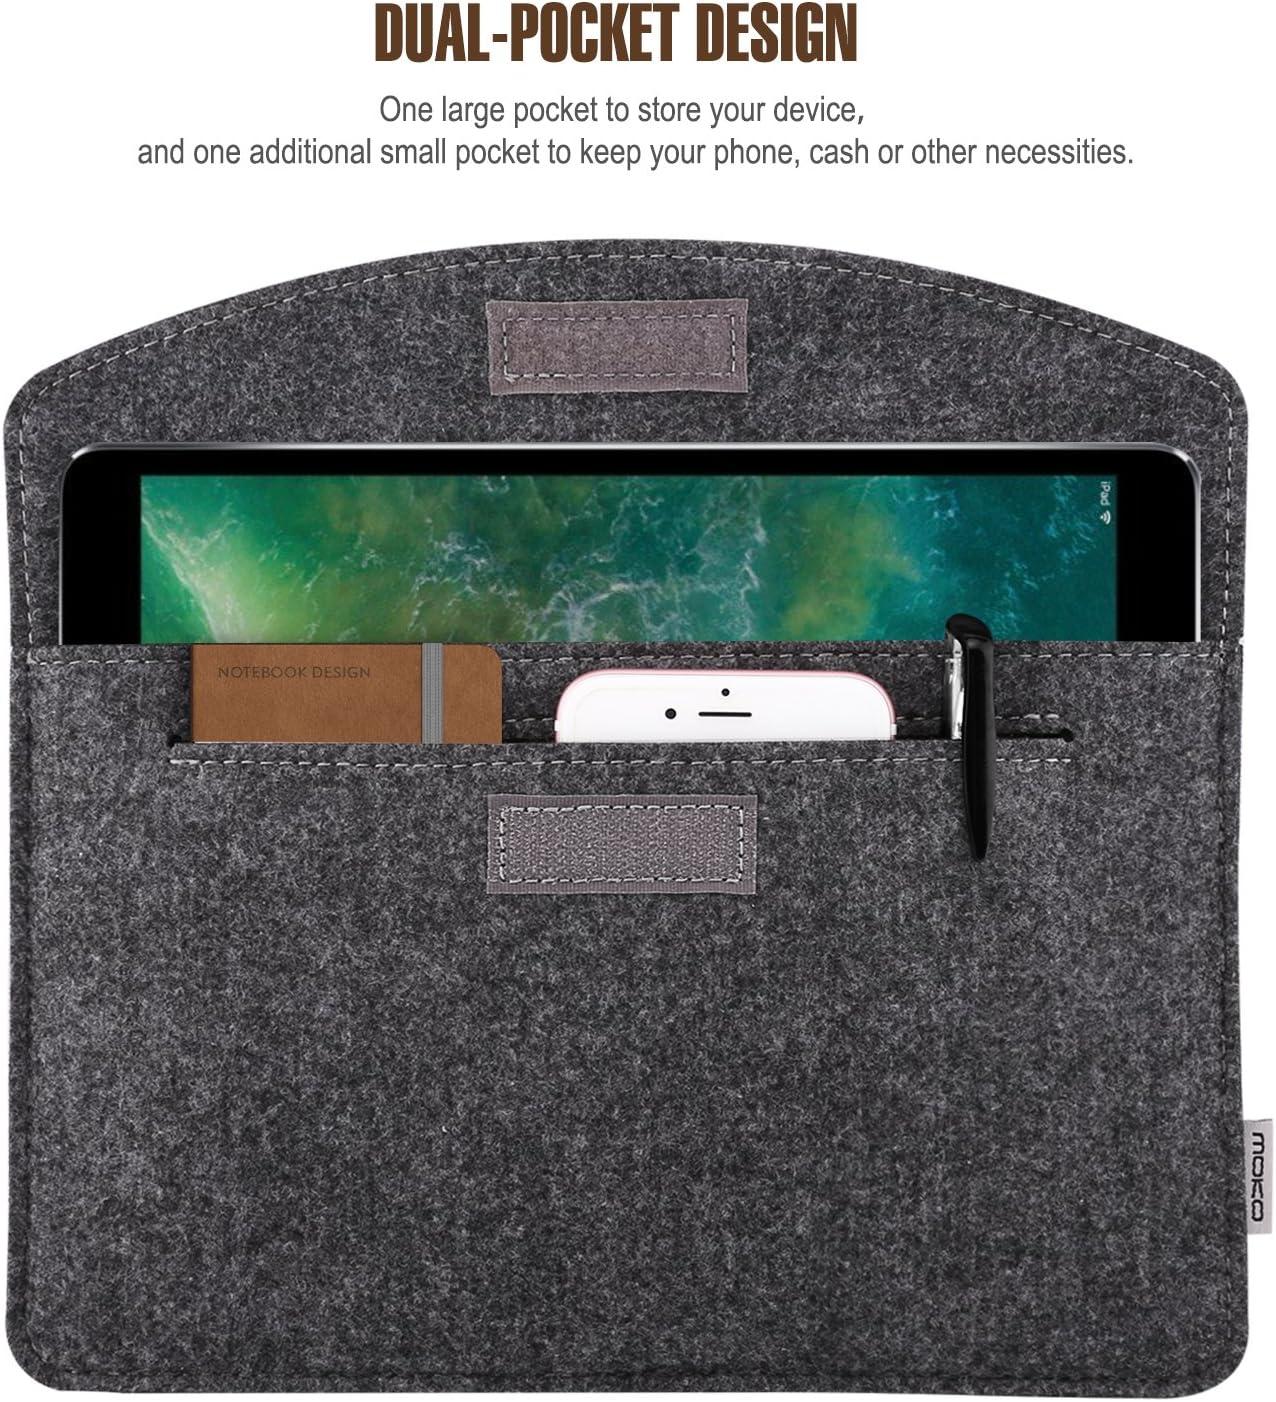 iPad Air /& Air 2 OrgaWise iPad Felt Sleeve Cover Case for iPad Pro 12.9 4 /& Samsung Galaxy Tab S 10.5 in Dark Grey Soft Felt Fabric 3 iPad 2